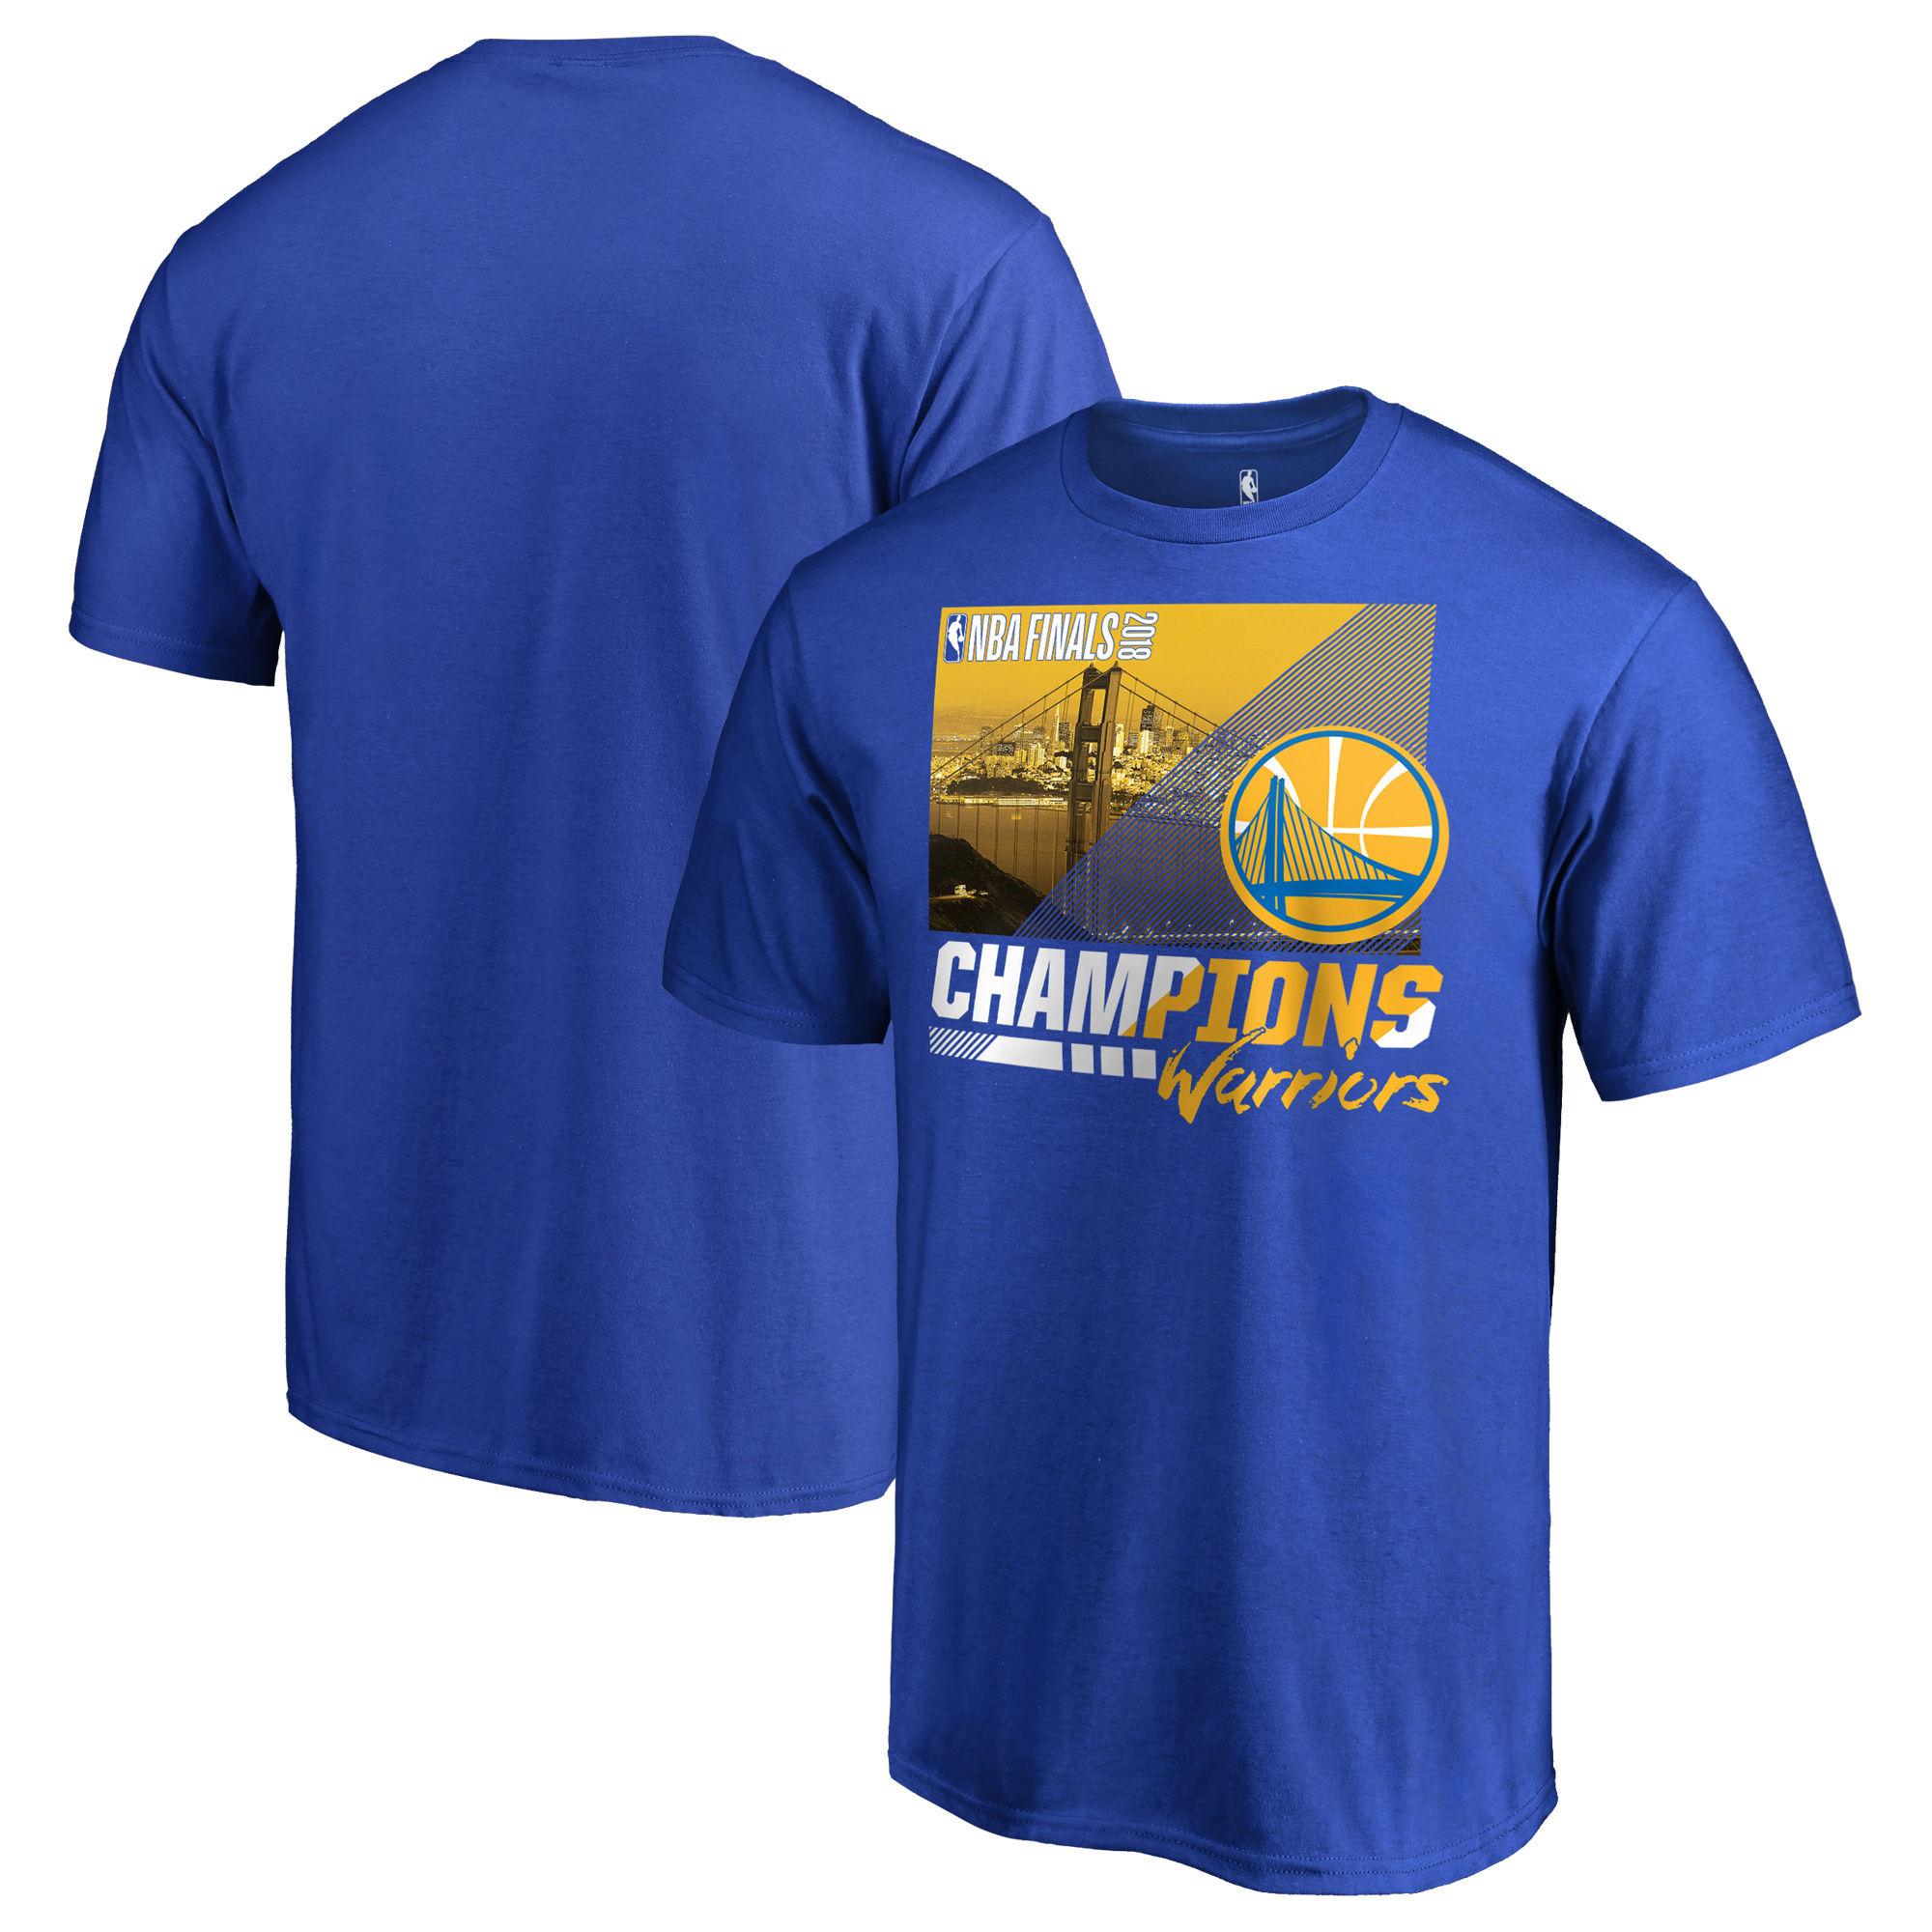 Golden State Warriors Fanatics Branded 2018 NBA Finals Champions Notorious Hometown City T-Shirt Royal